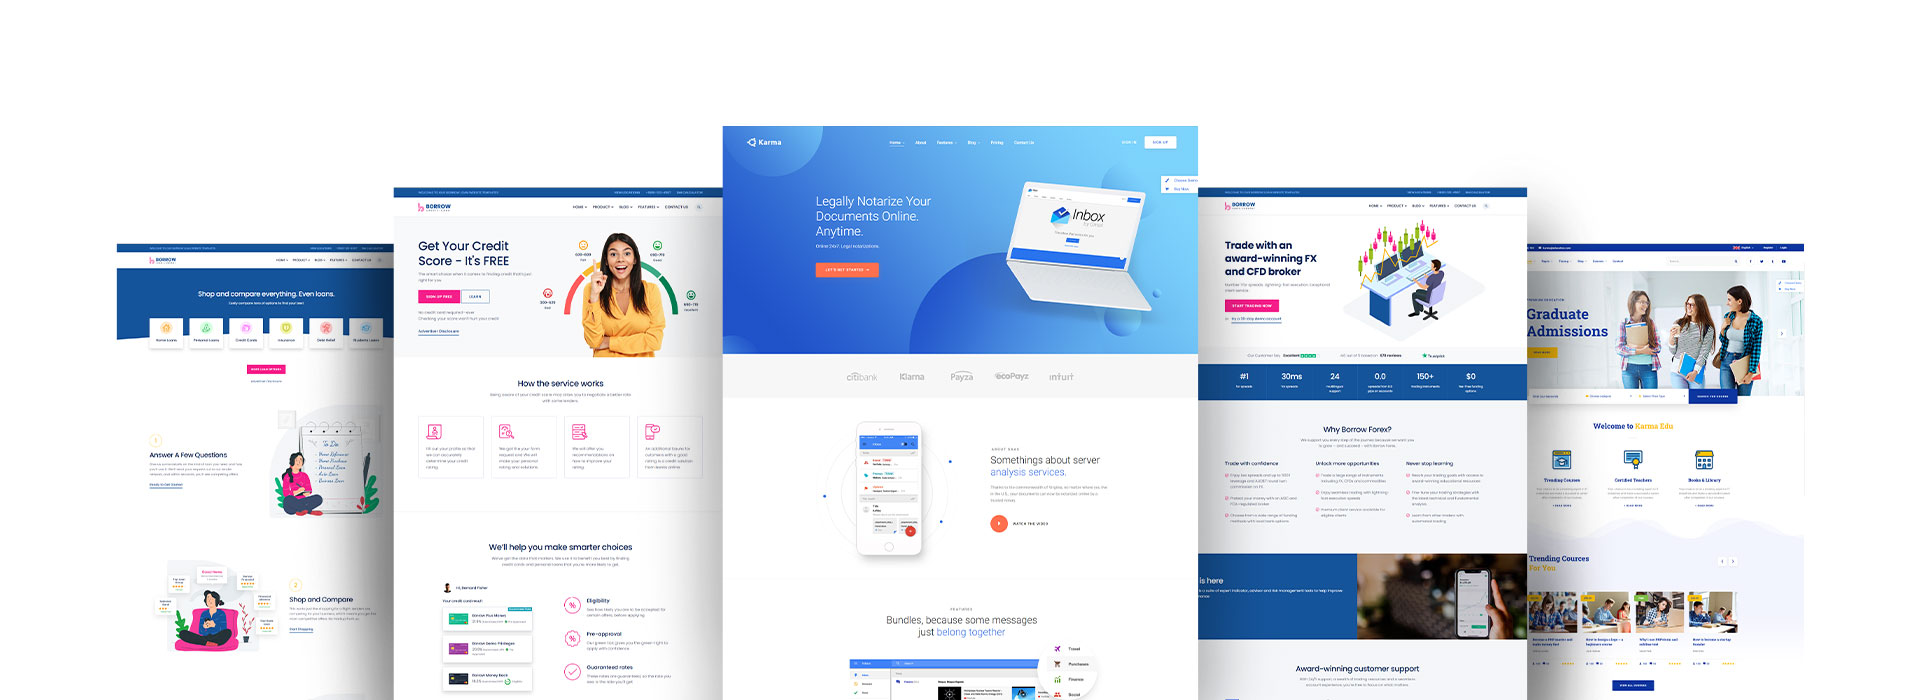 Squarespace Designing Web Pages